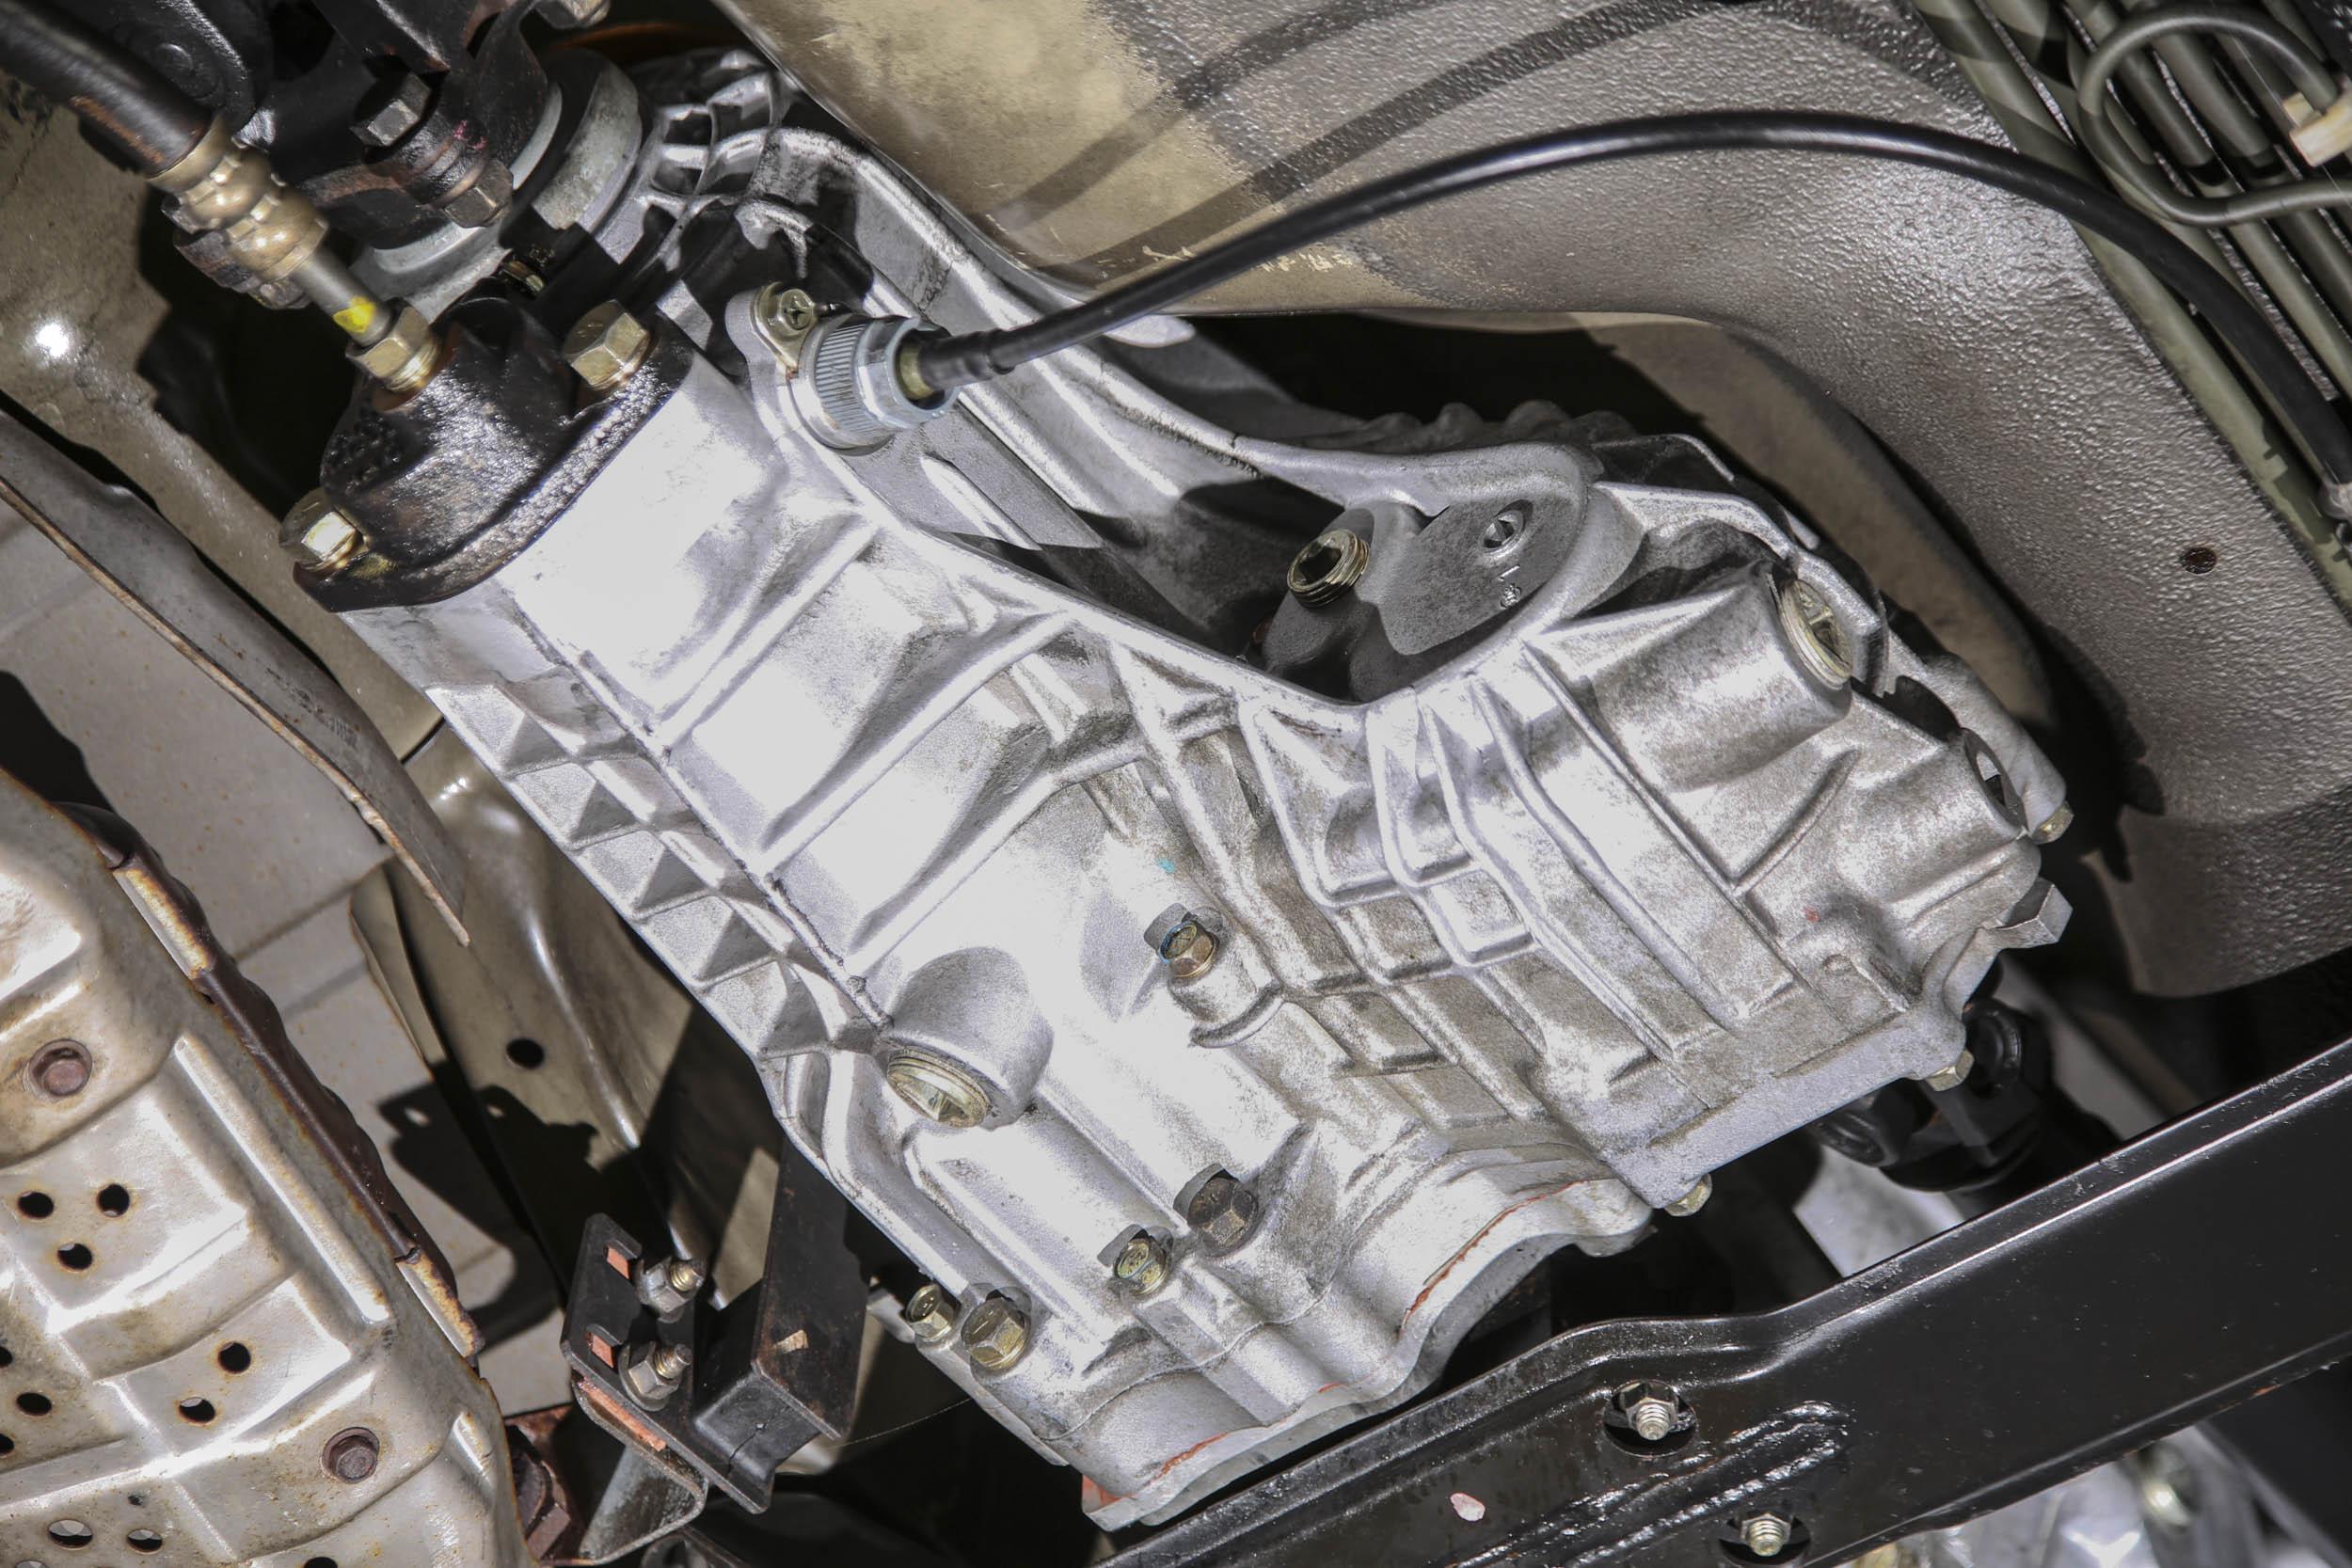 Nissan R32 GT-R transfer case